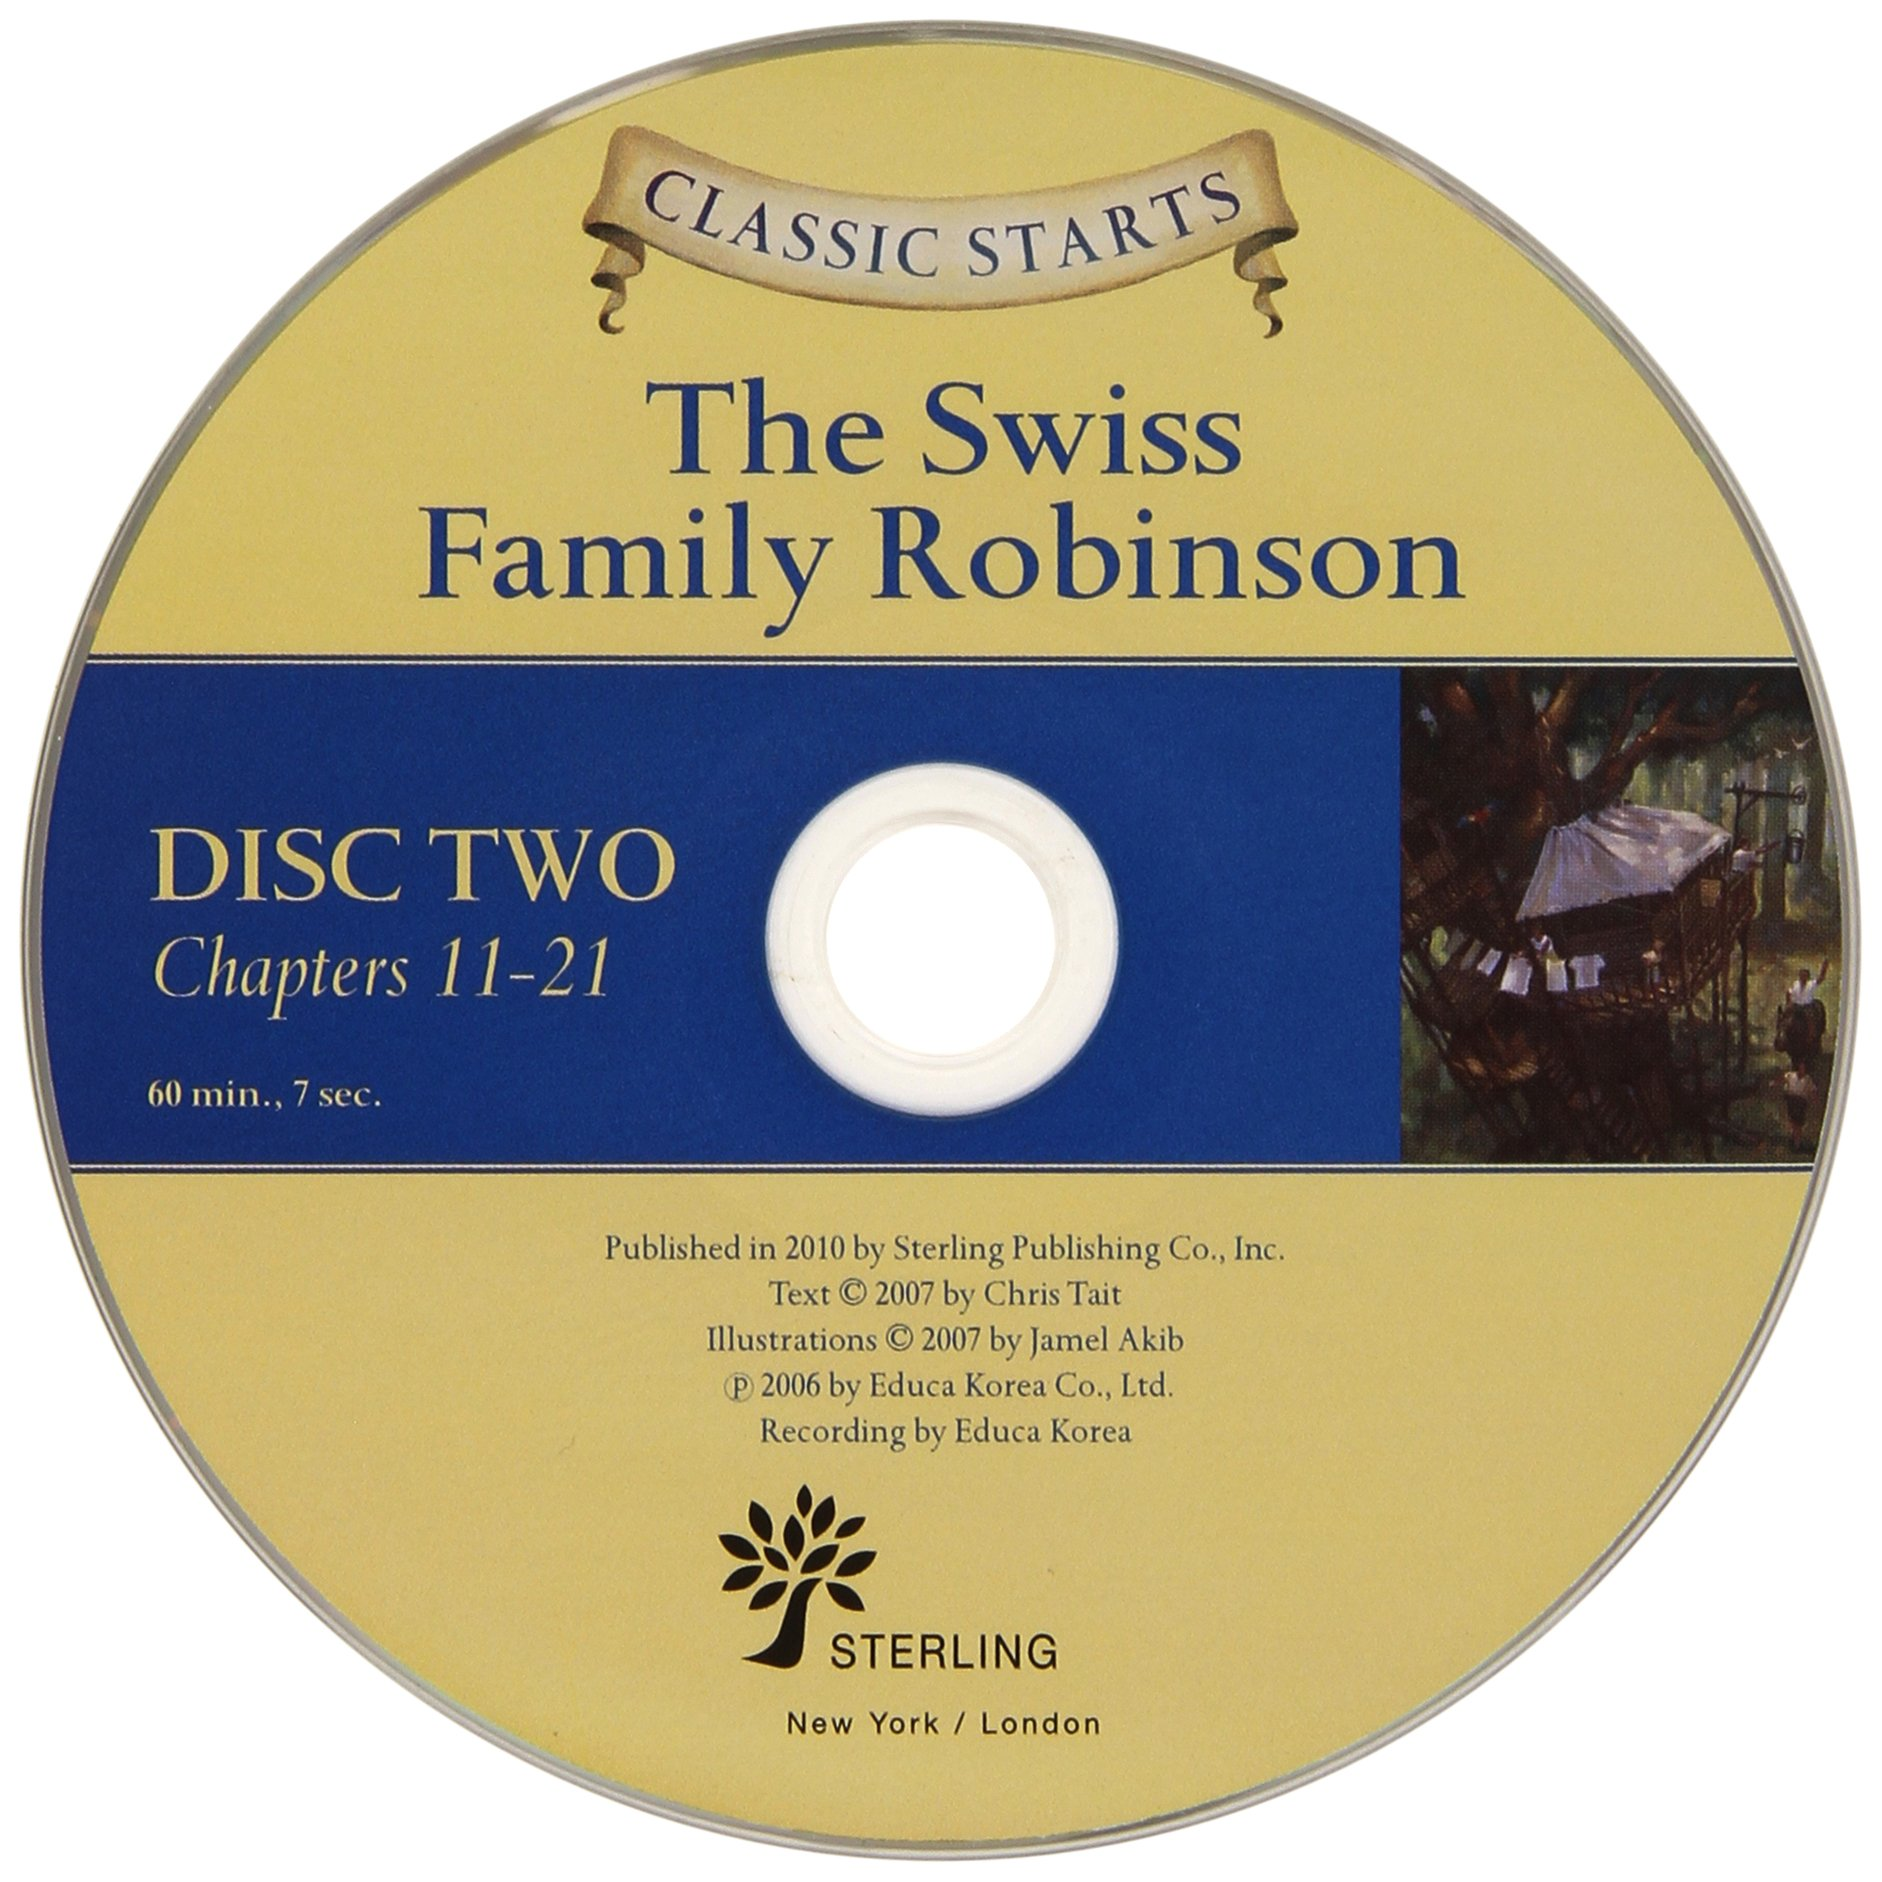 Classic Starts® Audio: The Swiss Family Robinson (Classic Starts® Series)